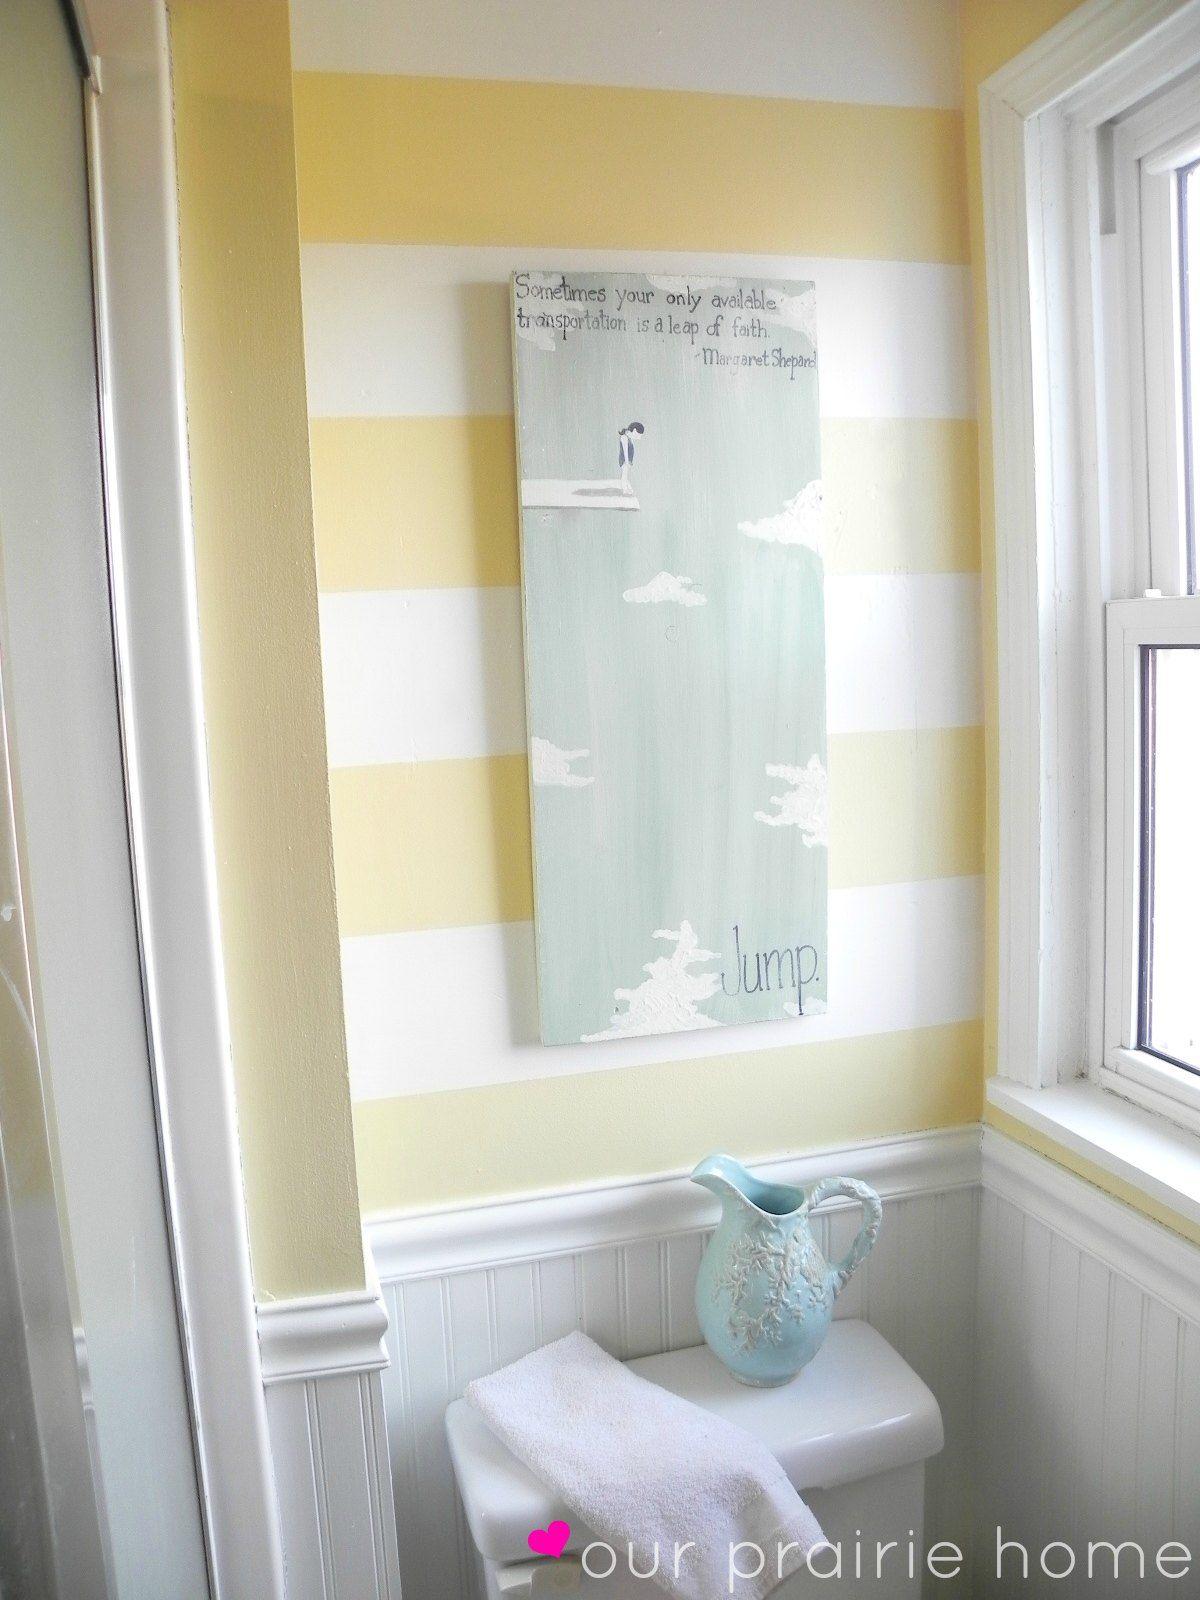 Our Prairie Home: Downstairs Bathroom {A Reveal} Striped Accent Wall ...